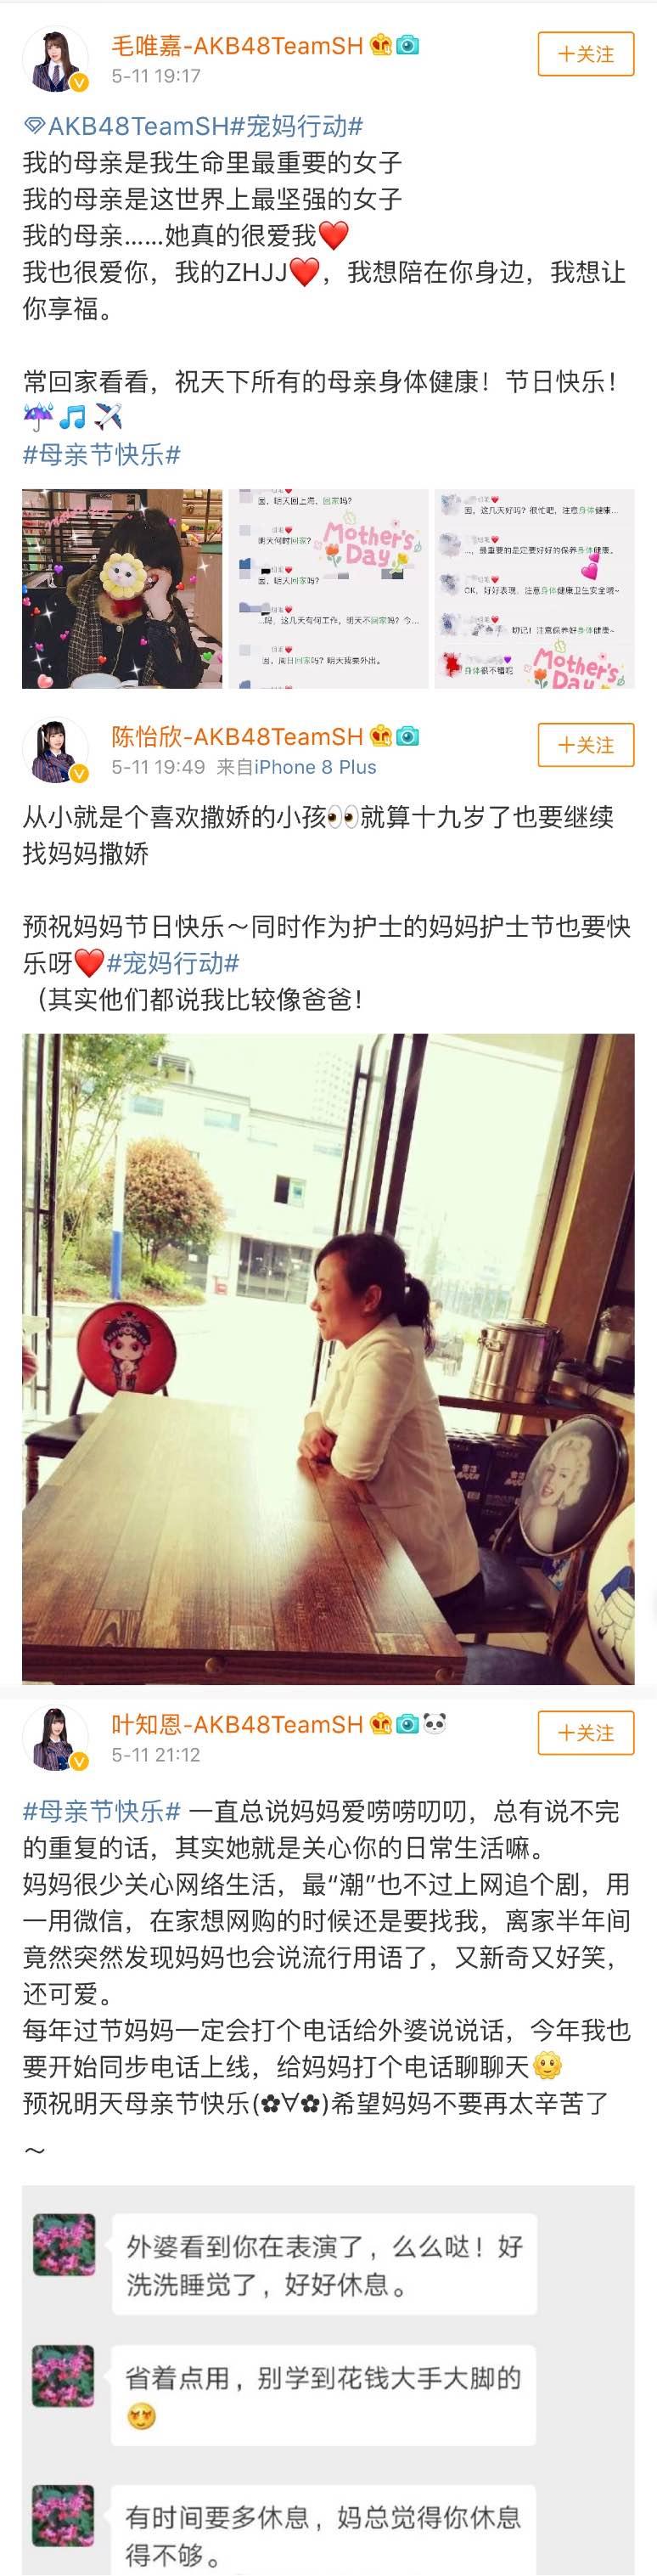 AKB48 Team SH成员发博表白母亲(二).jpg